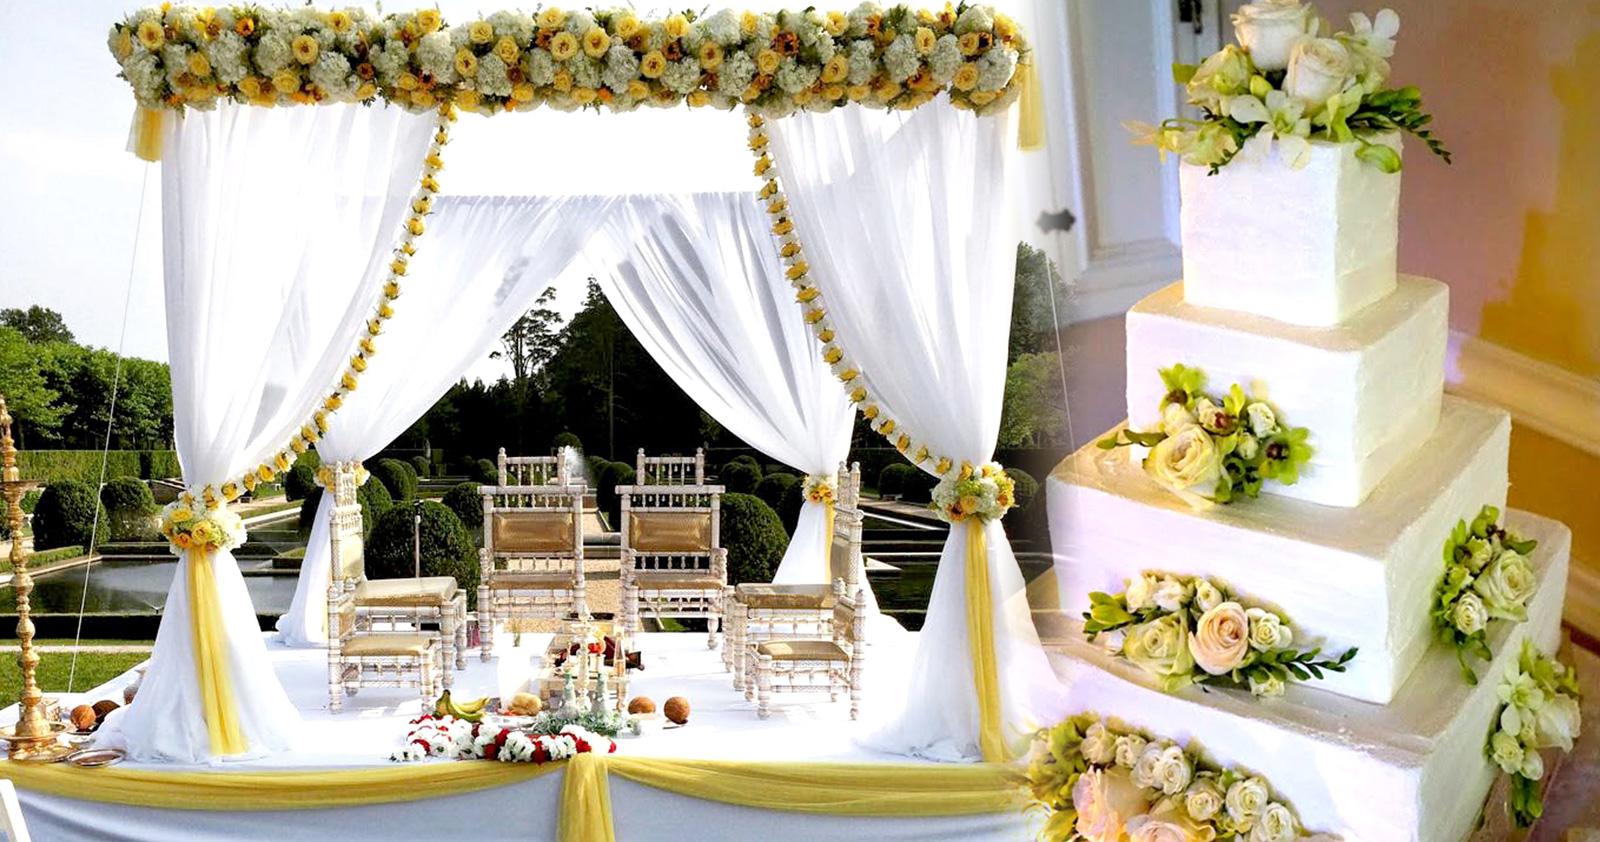 wedding planner jobs nyc - Wedding Decor Ideas